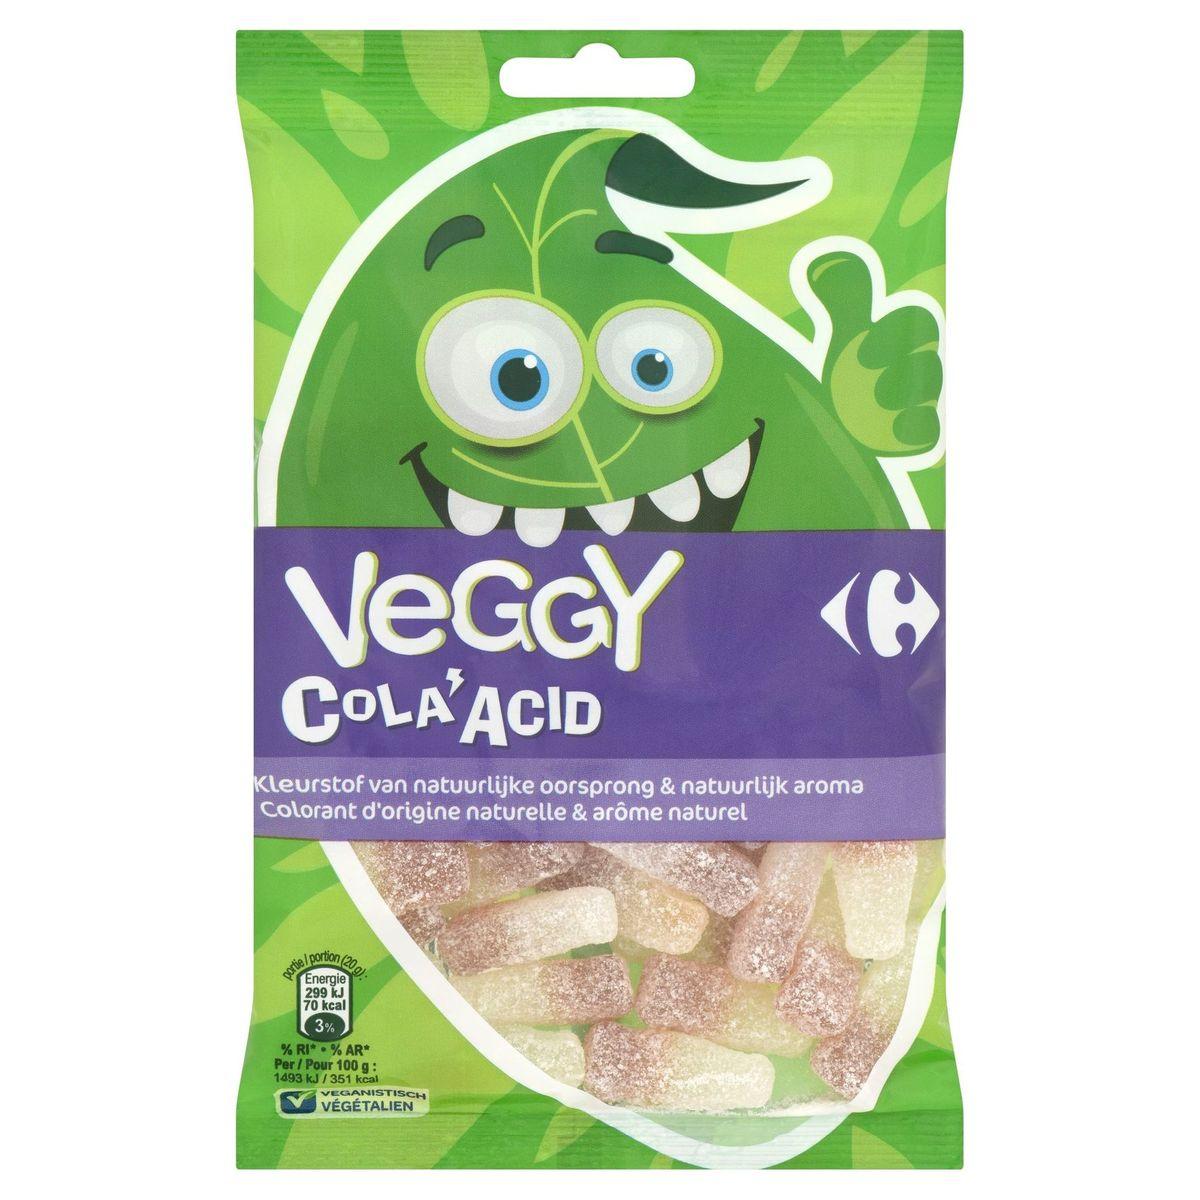 Carrefour Veggy Cola Acid 150 g